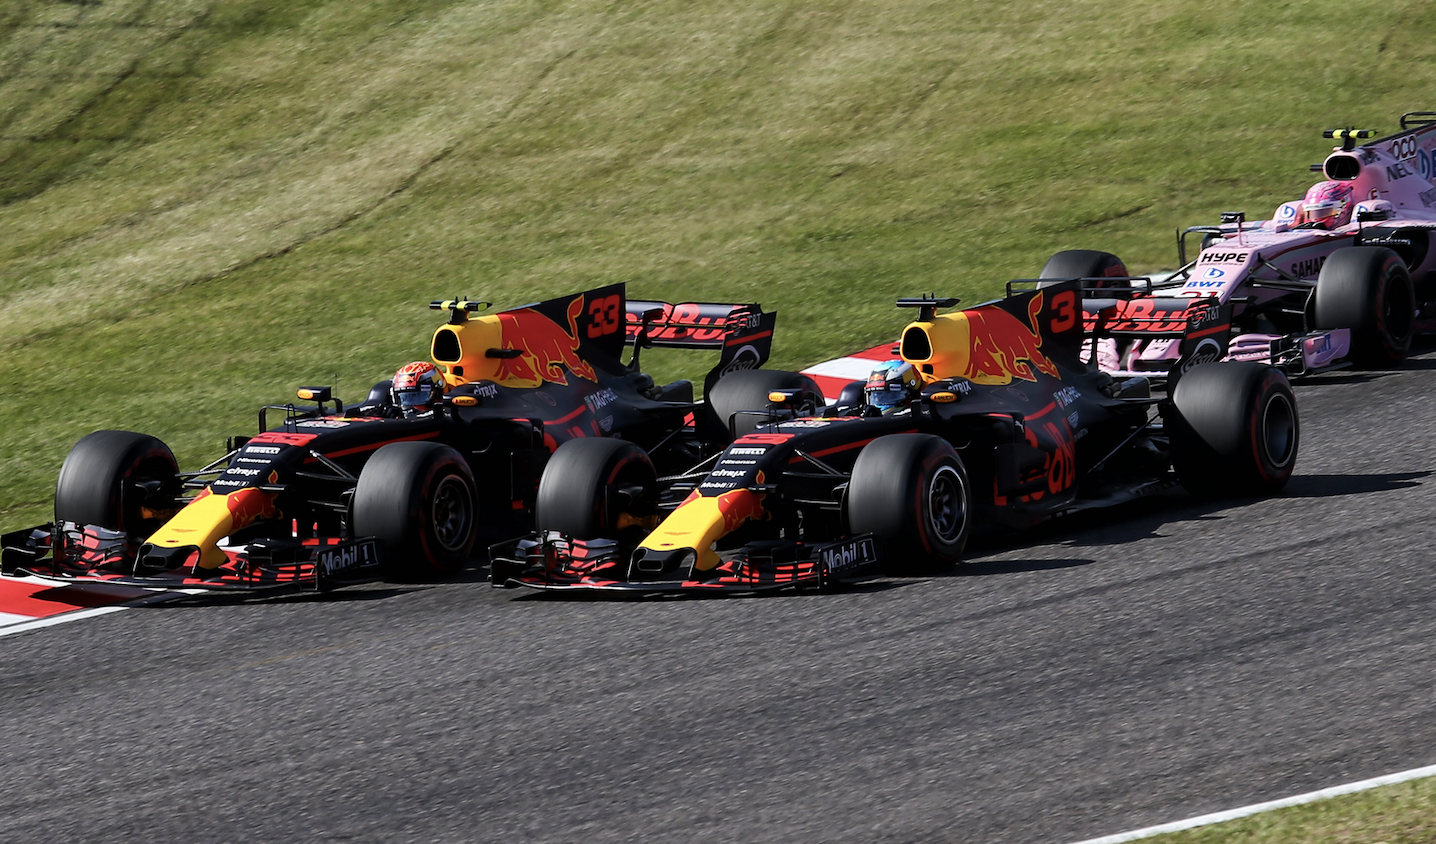 Daniel Ricciardo, Max Verstappen - Red Bull Racing [2016]